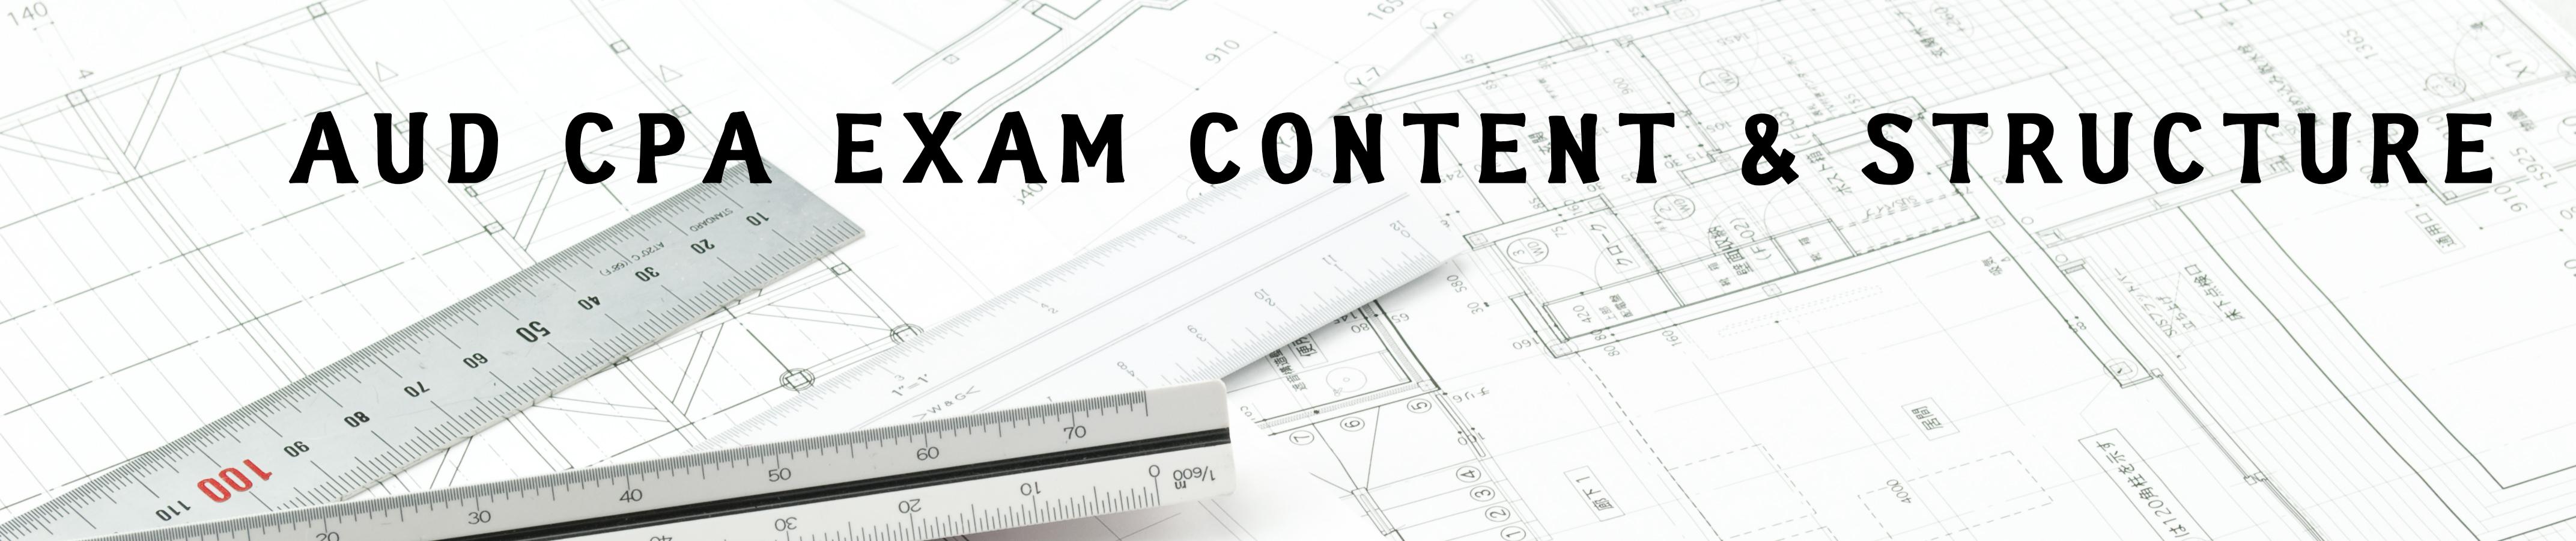 AUD CPA Exam Content & Structure